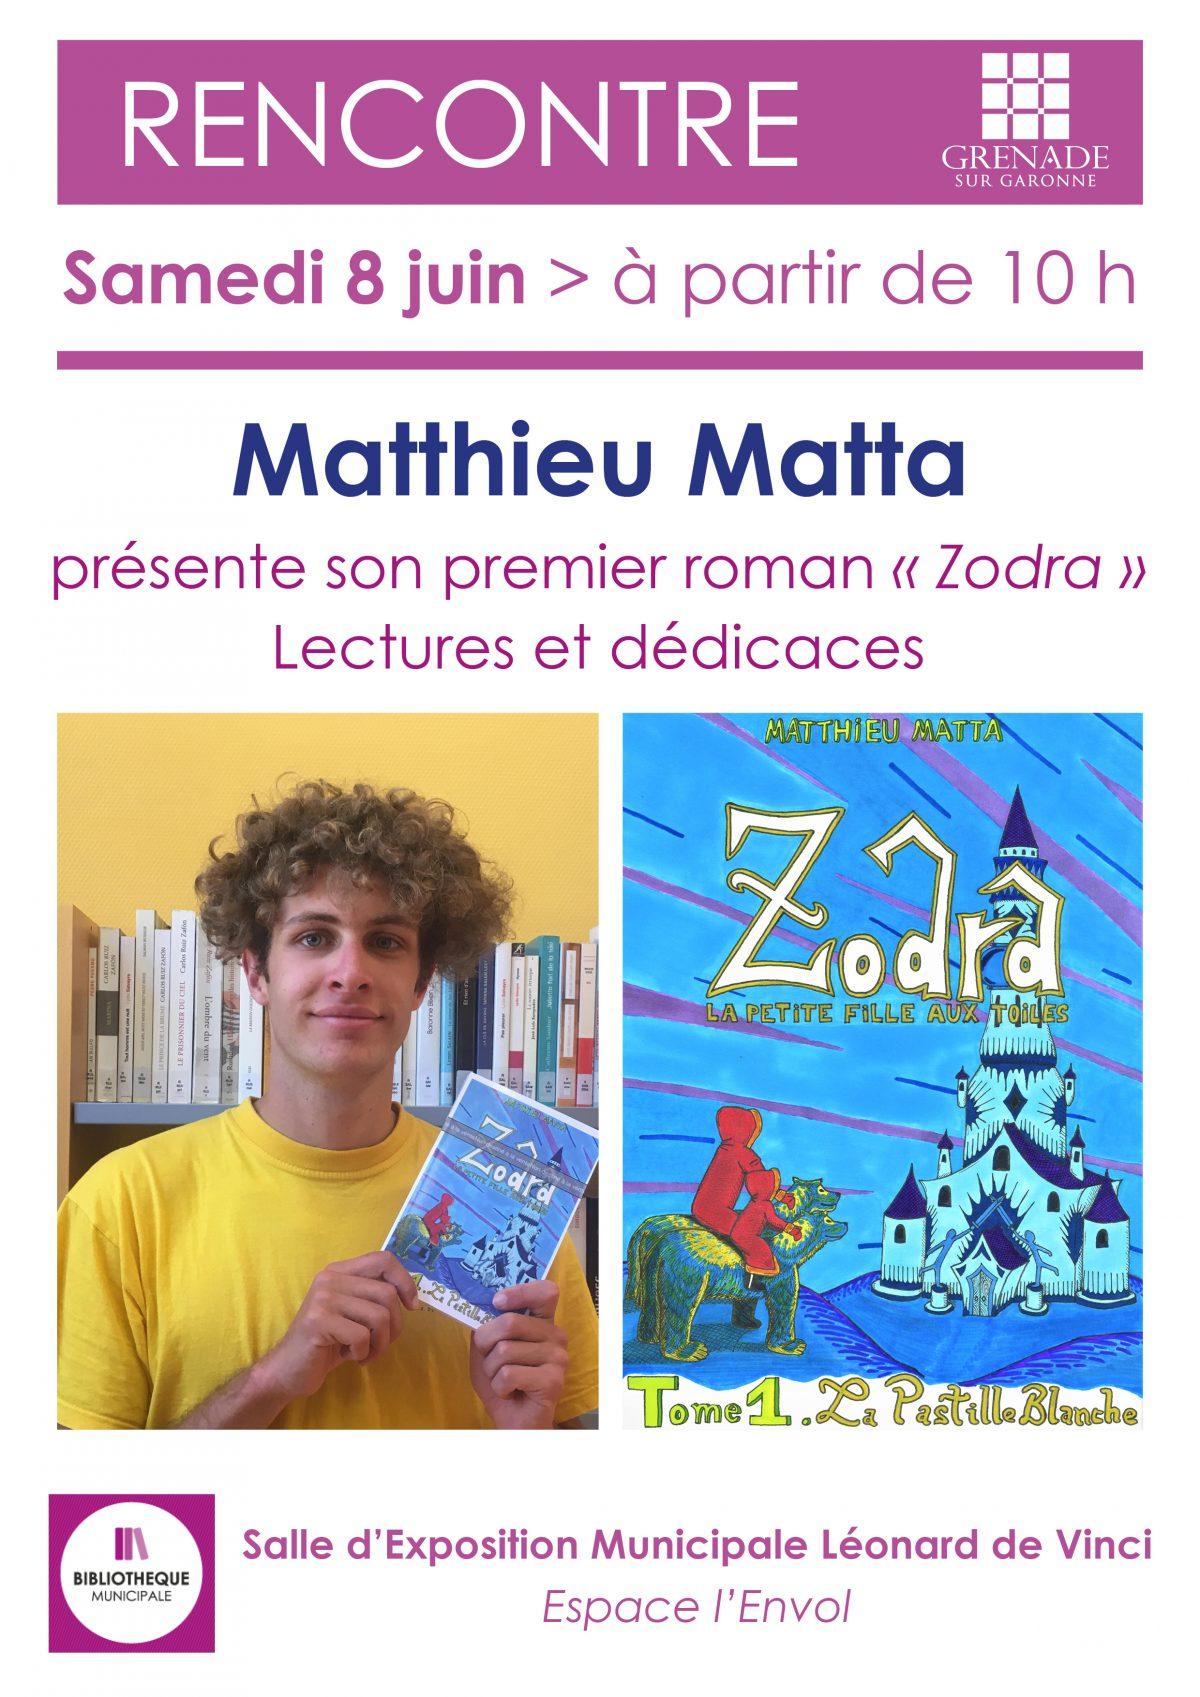 Rencontre avec Matthieu Matta, auteur grenadain